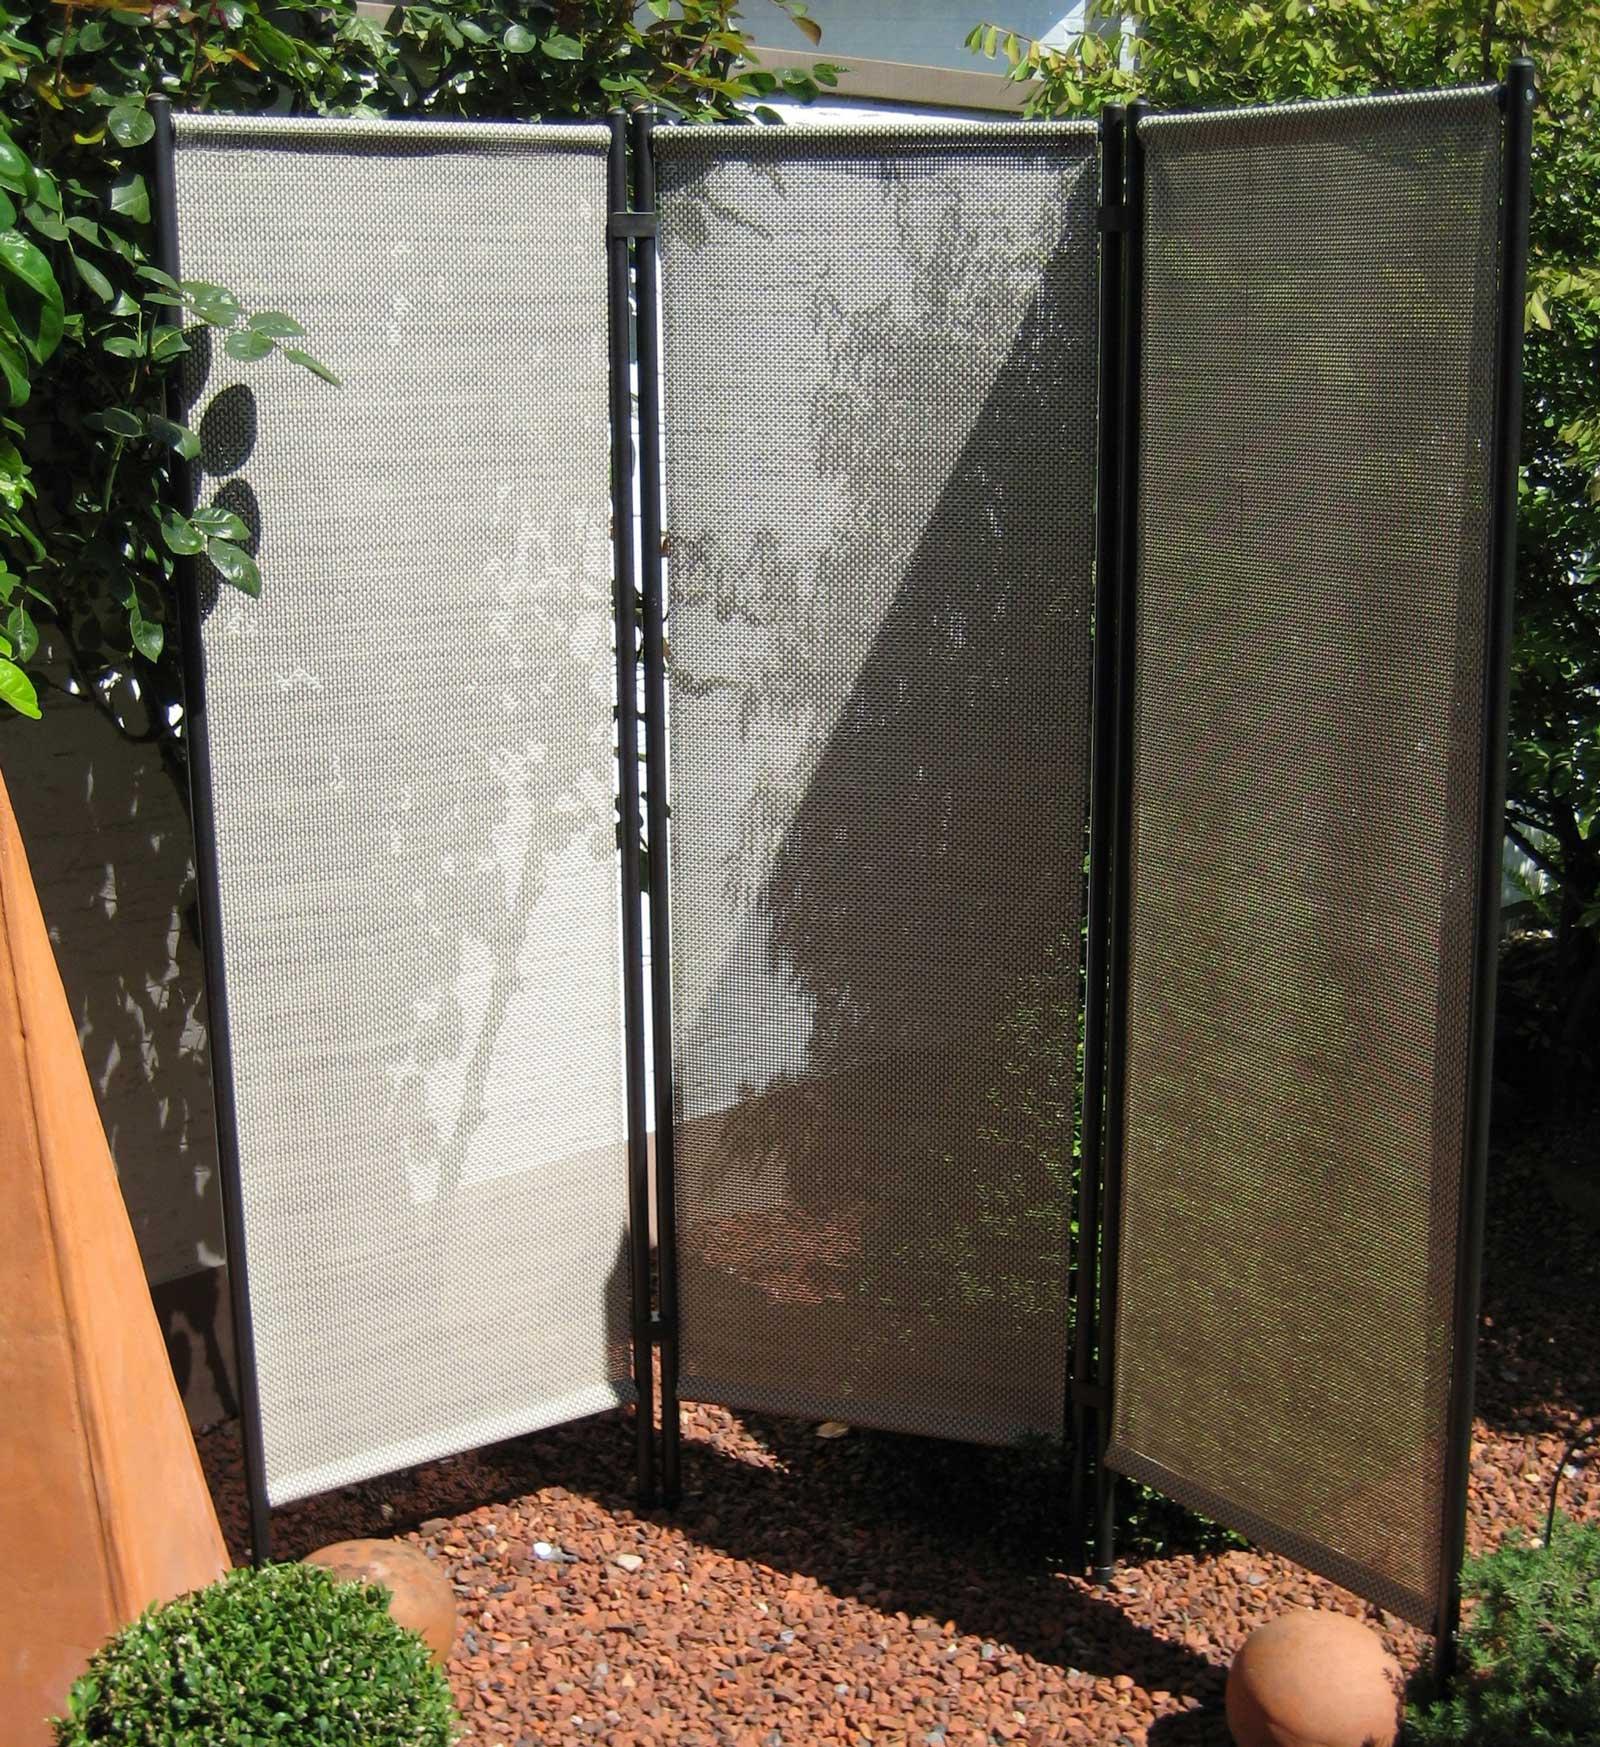 sichtschutz paravent stahl textil schilf 3 teilig 150x156cm bei. Black Bedroom Furniture Sets. Home Design Ideas